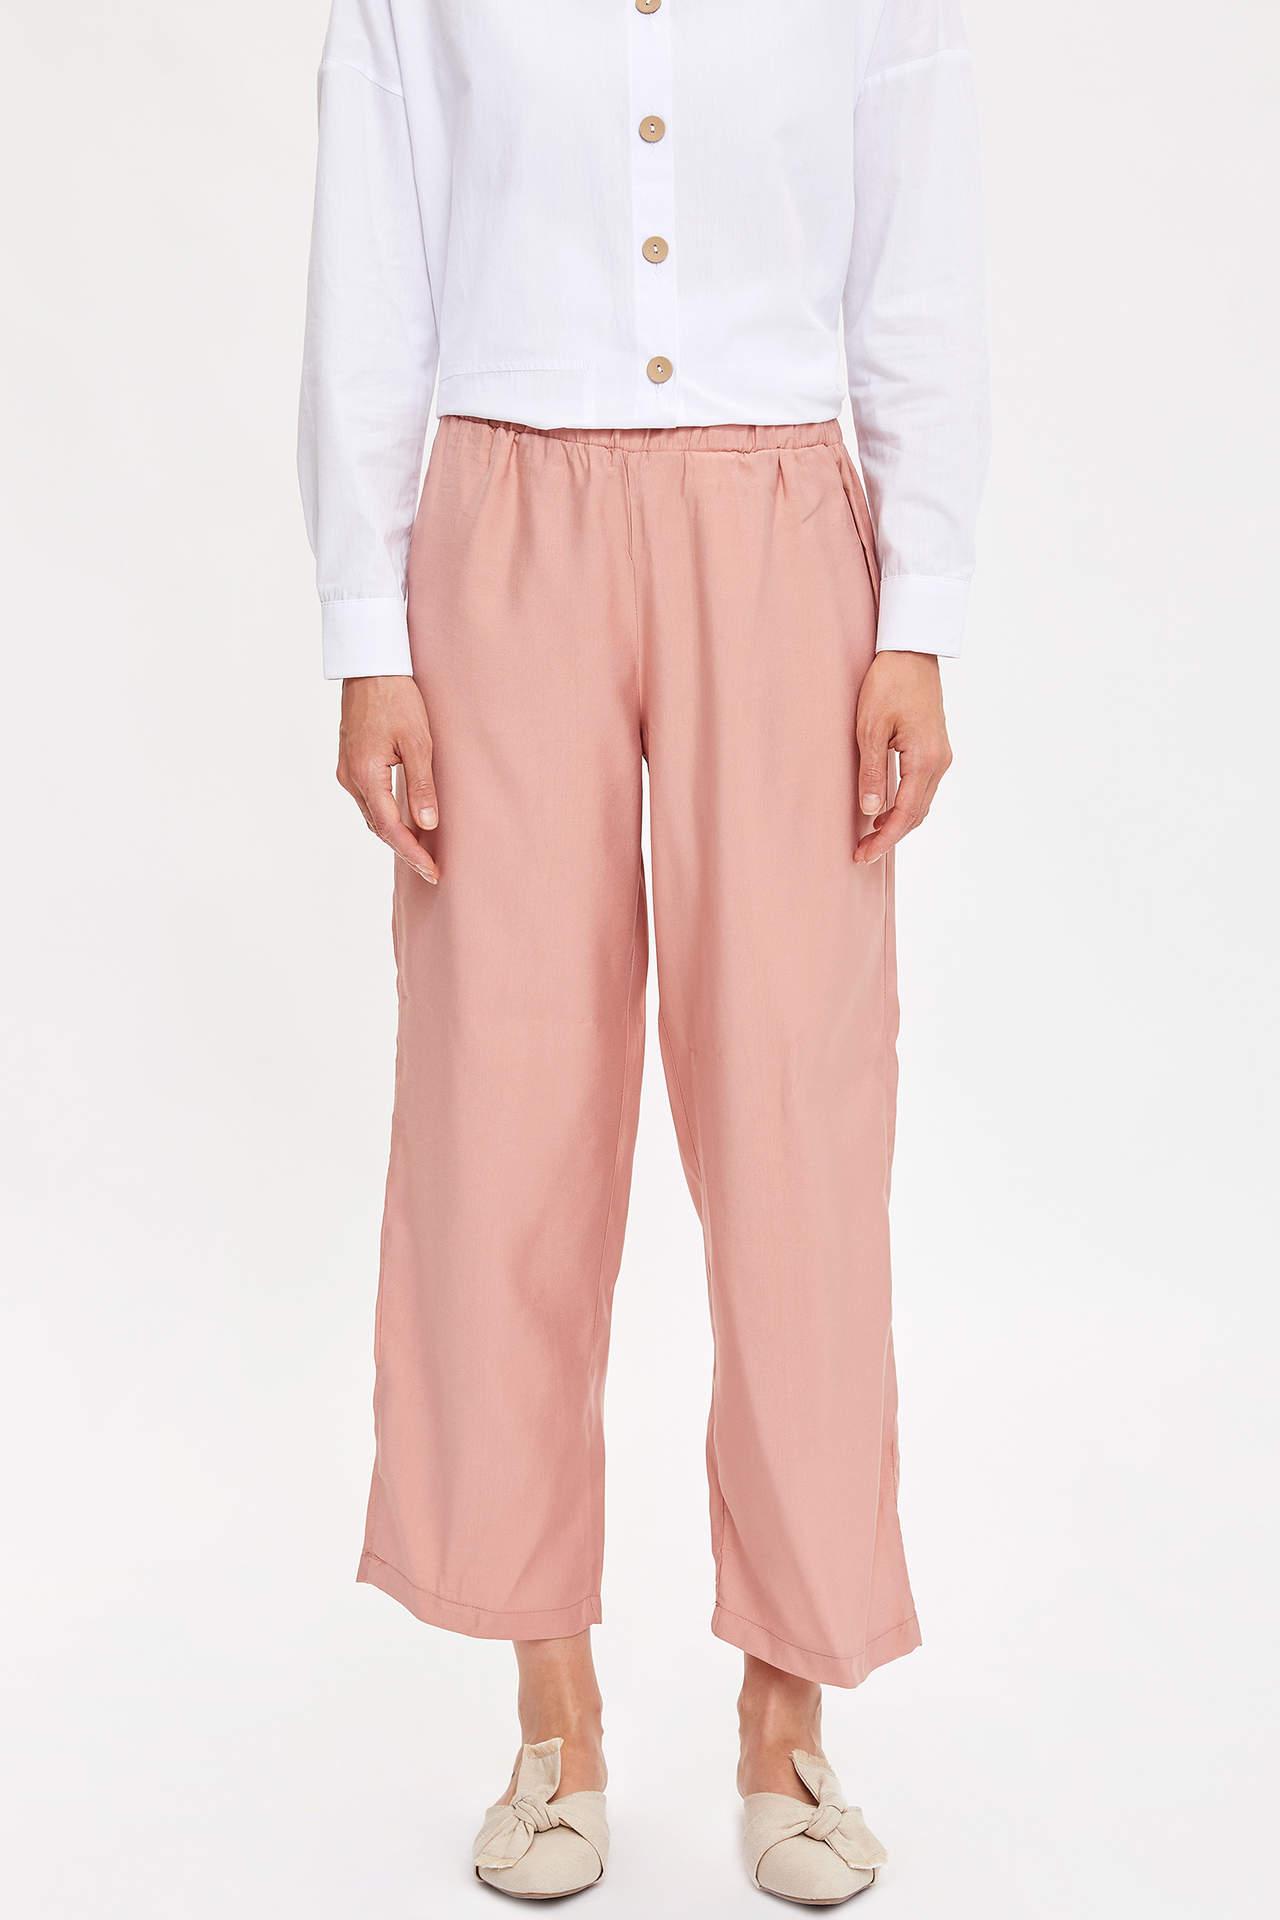 Defacto Kadın Relax Fit Dokunma Pantolon